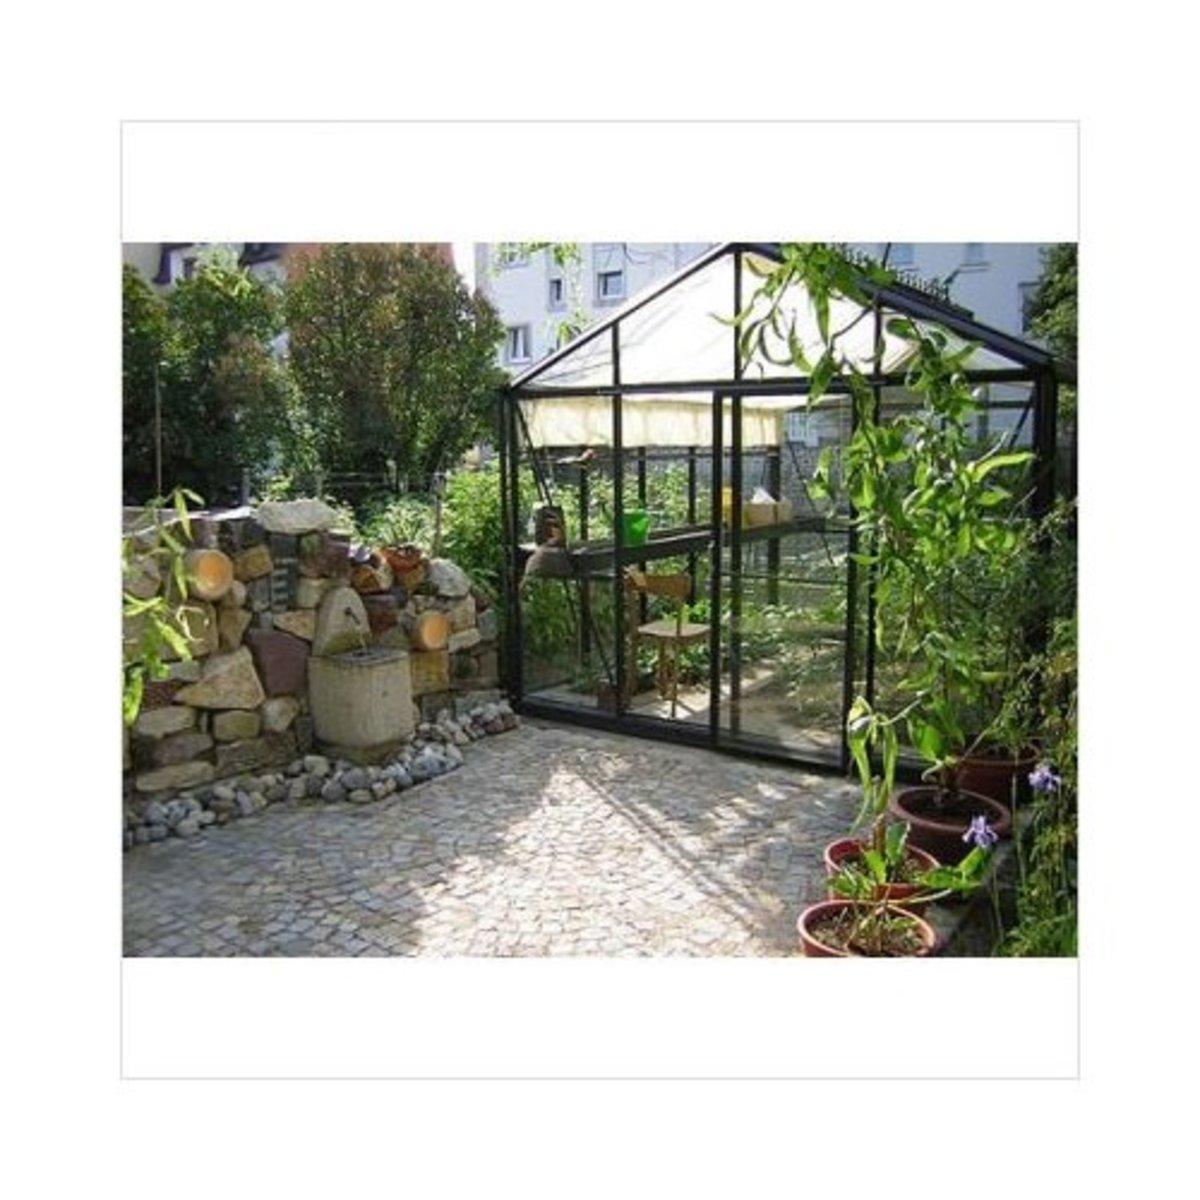 Janssens of Belgium VI34/PP4L Royal Victorian 10' x 15' Glass Greenhouse w/Accessories